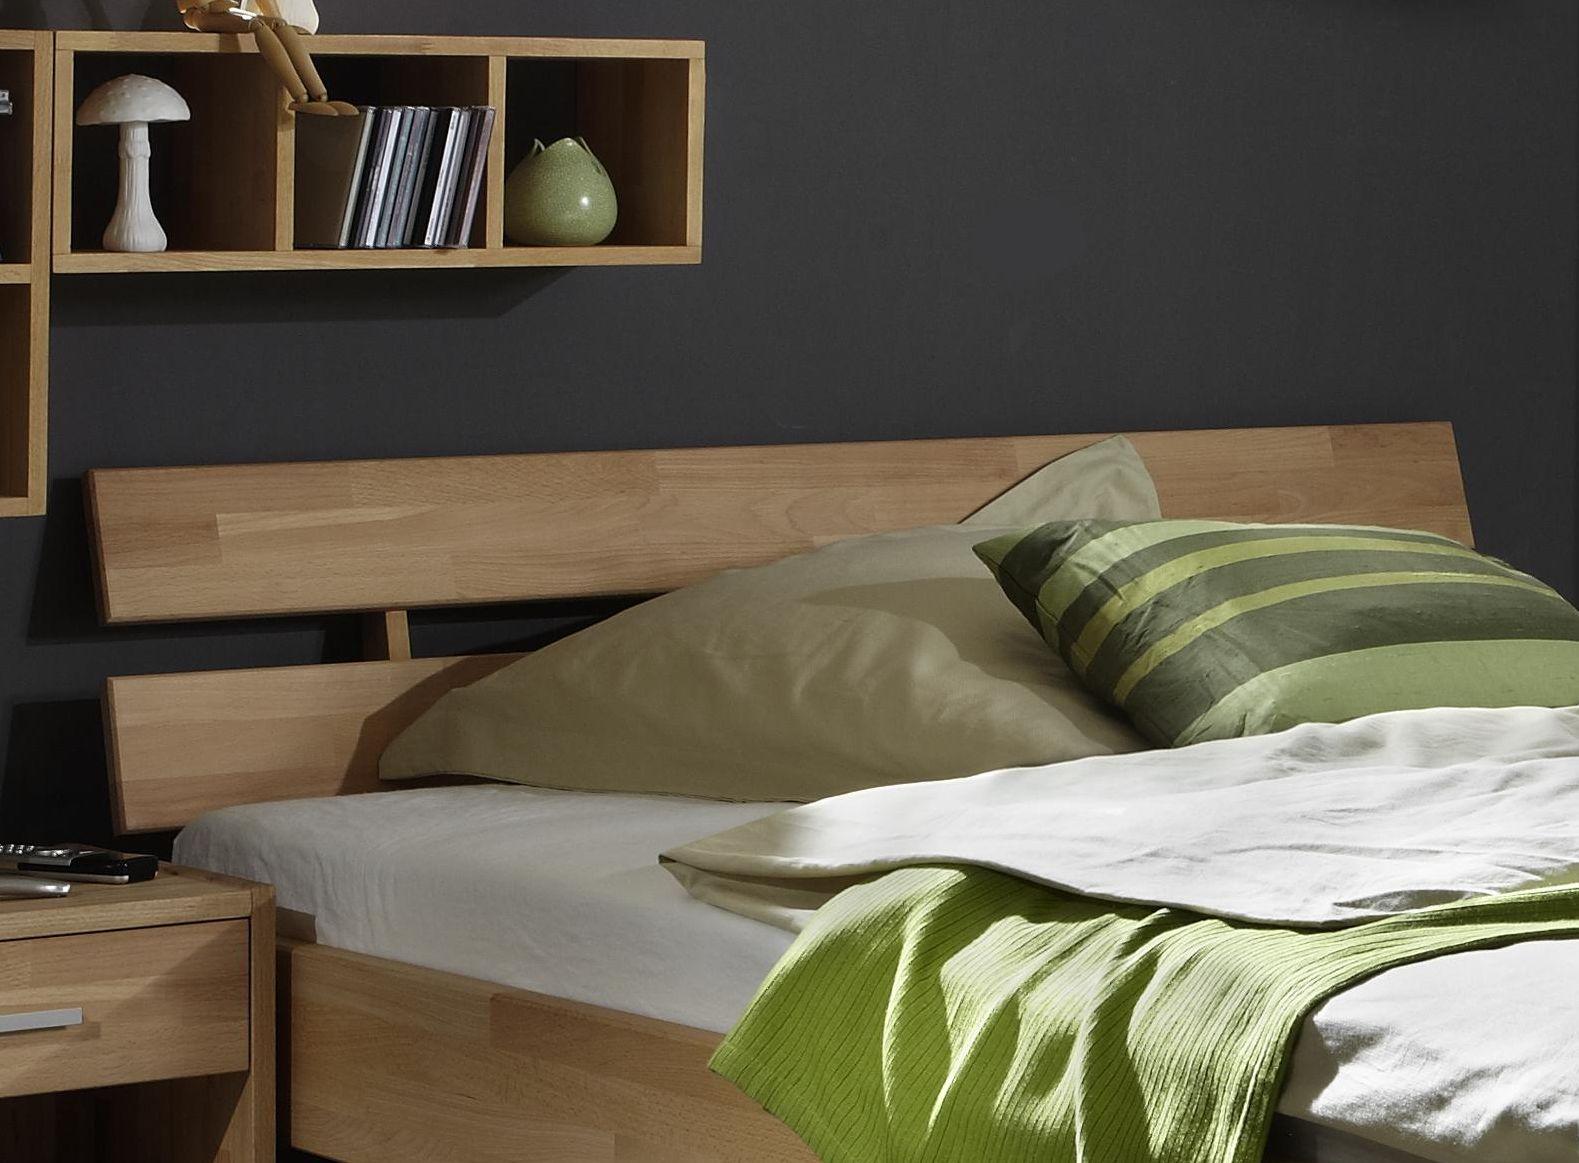 echtholz einzelbett bett kernbuche massiv ge lt gamma. Black Bedroom Furniture Sets. Home Design Ideas